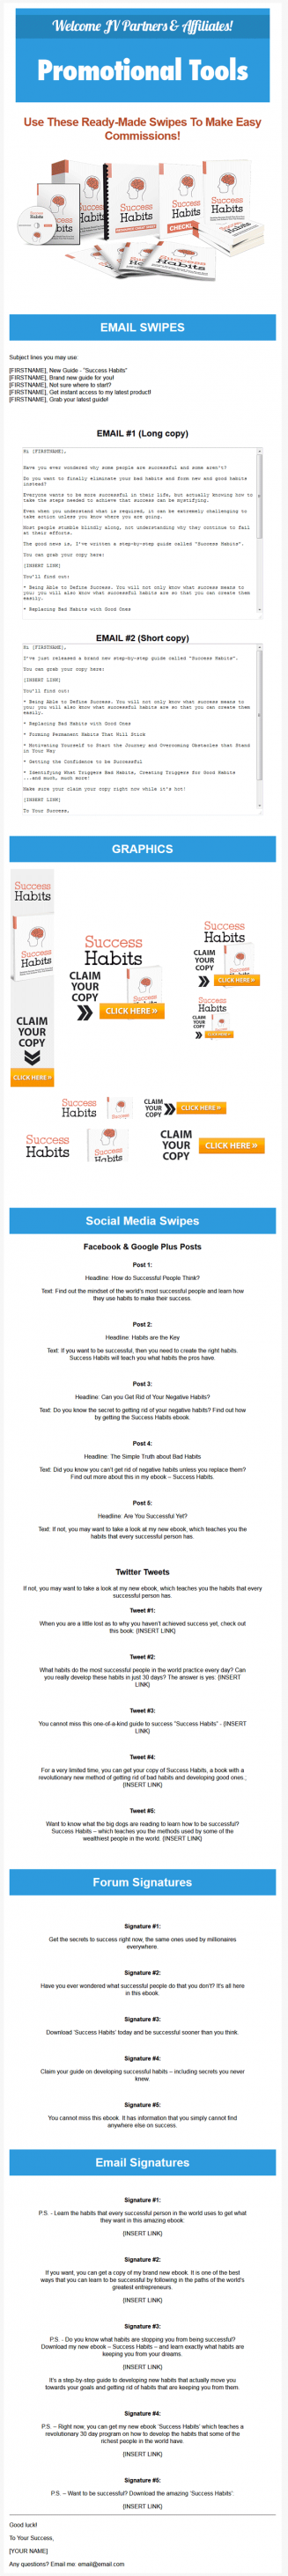 success habits ebook and videos